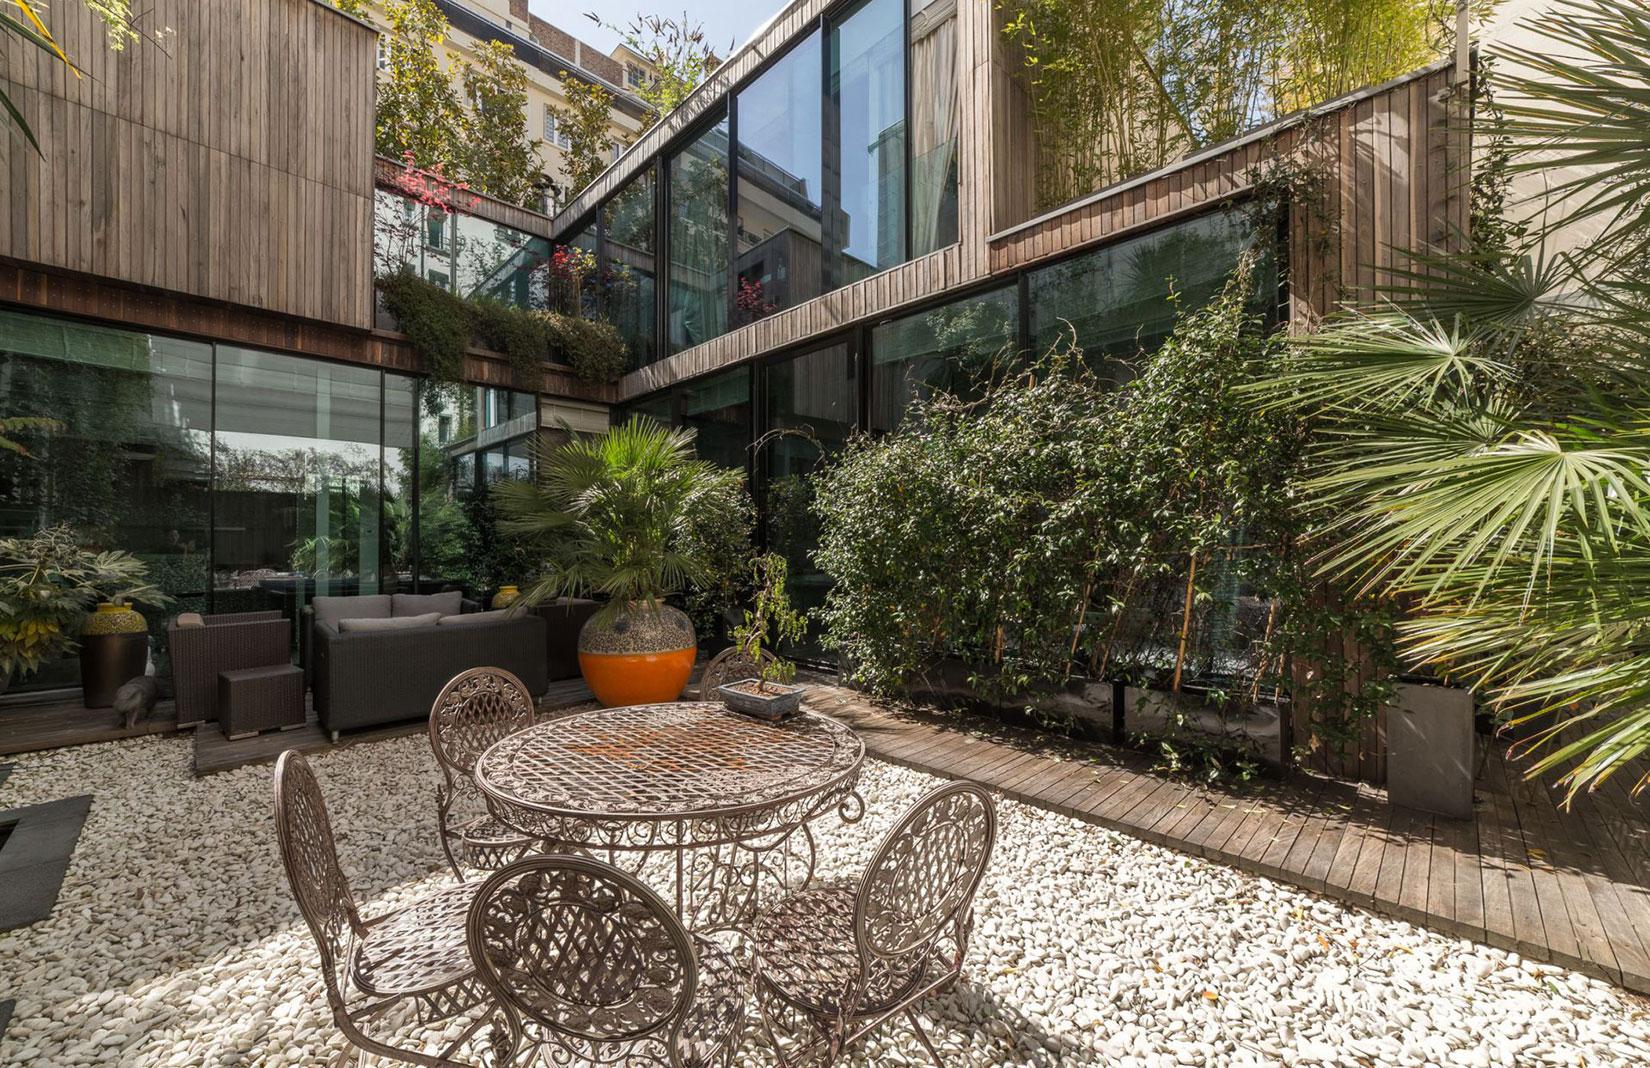 6 spectacular paris properties for sale